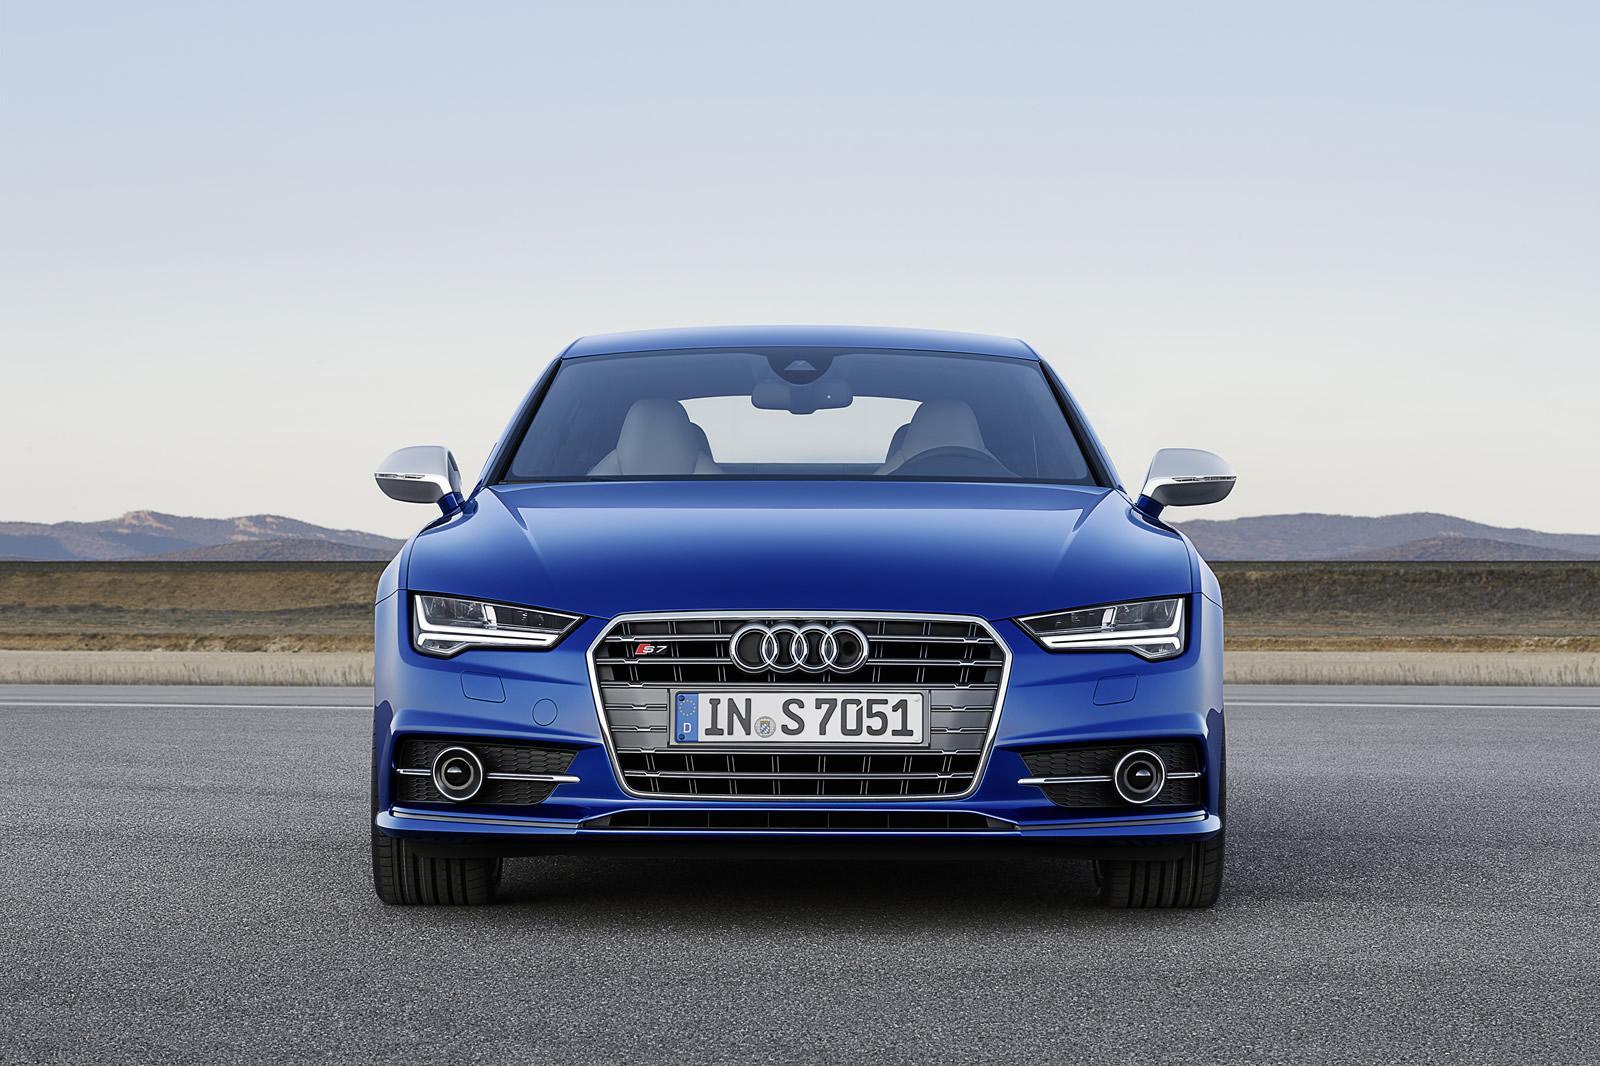 Audi S7 Facelift Wallpaper   HD 1600x1066